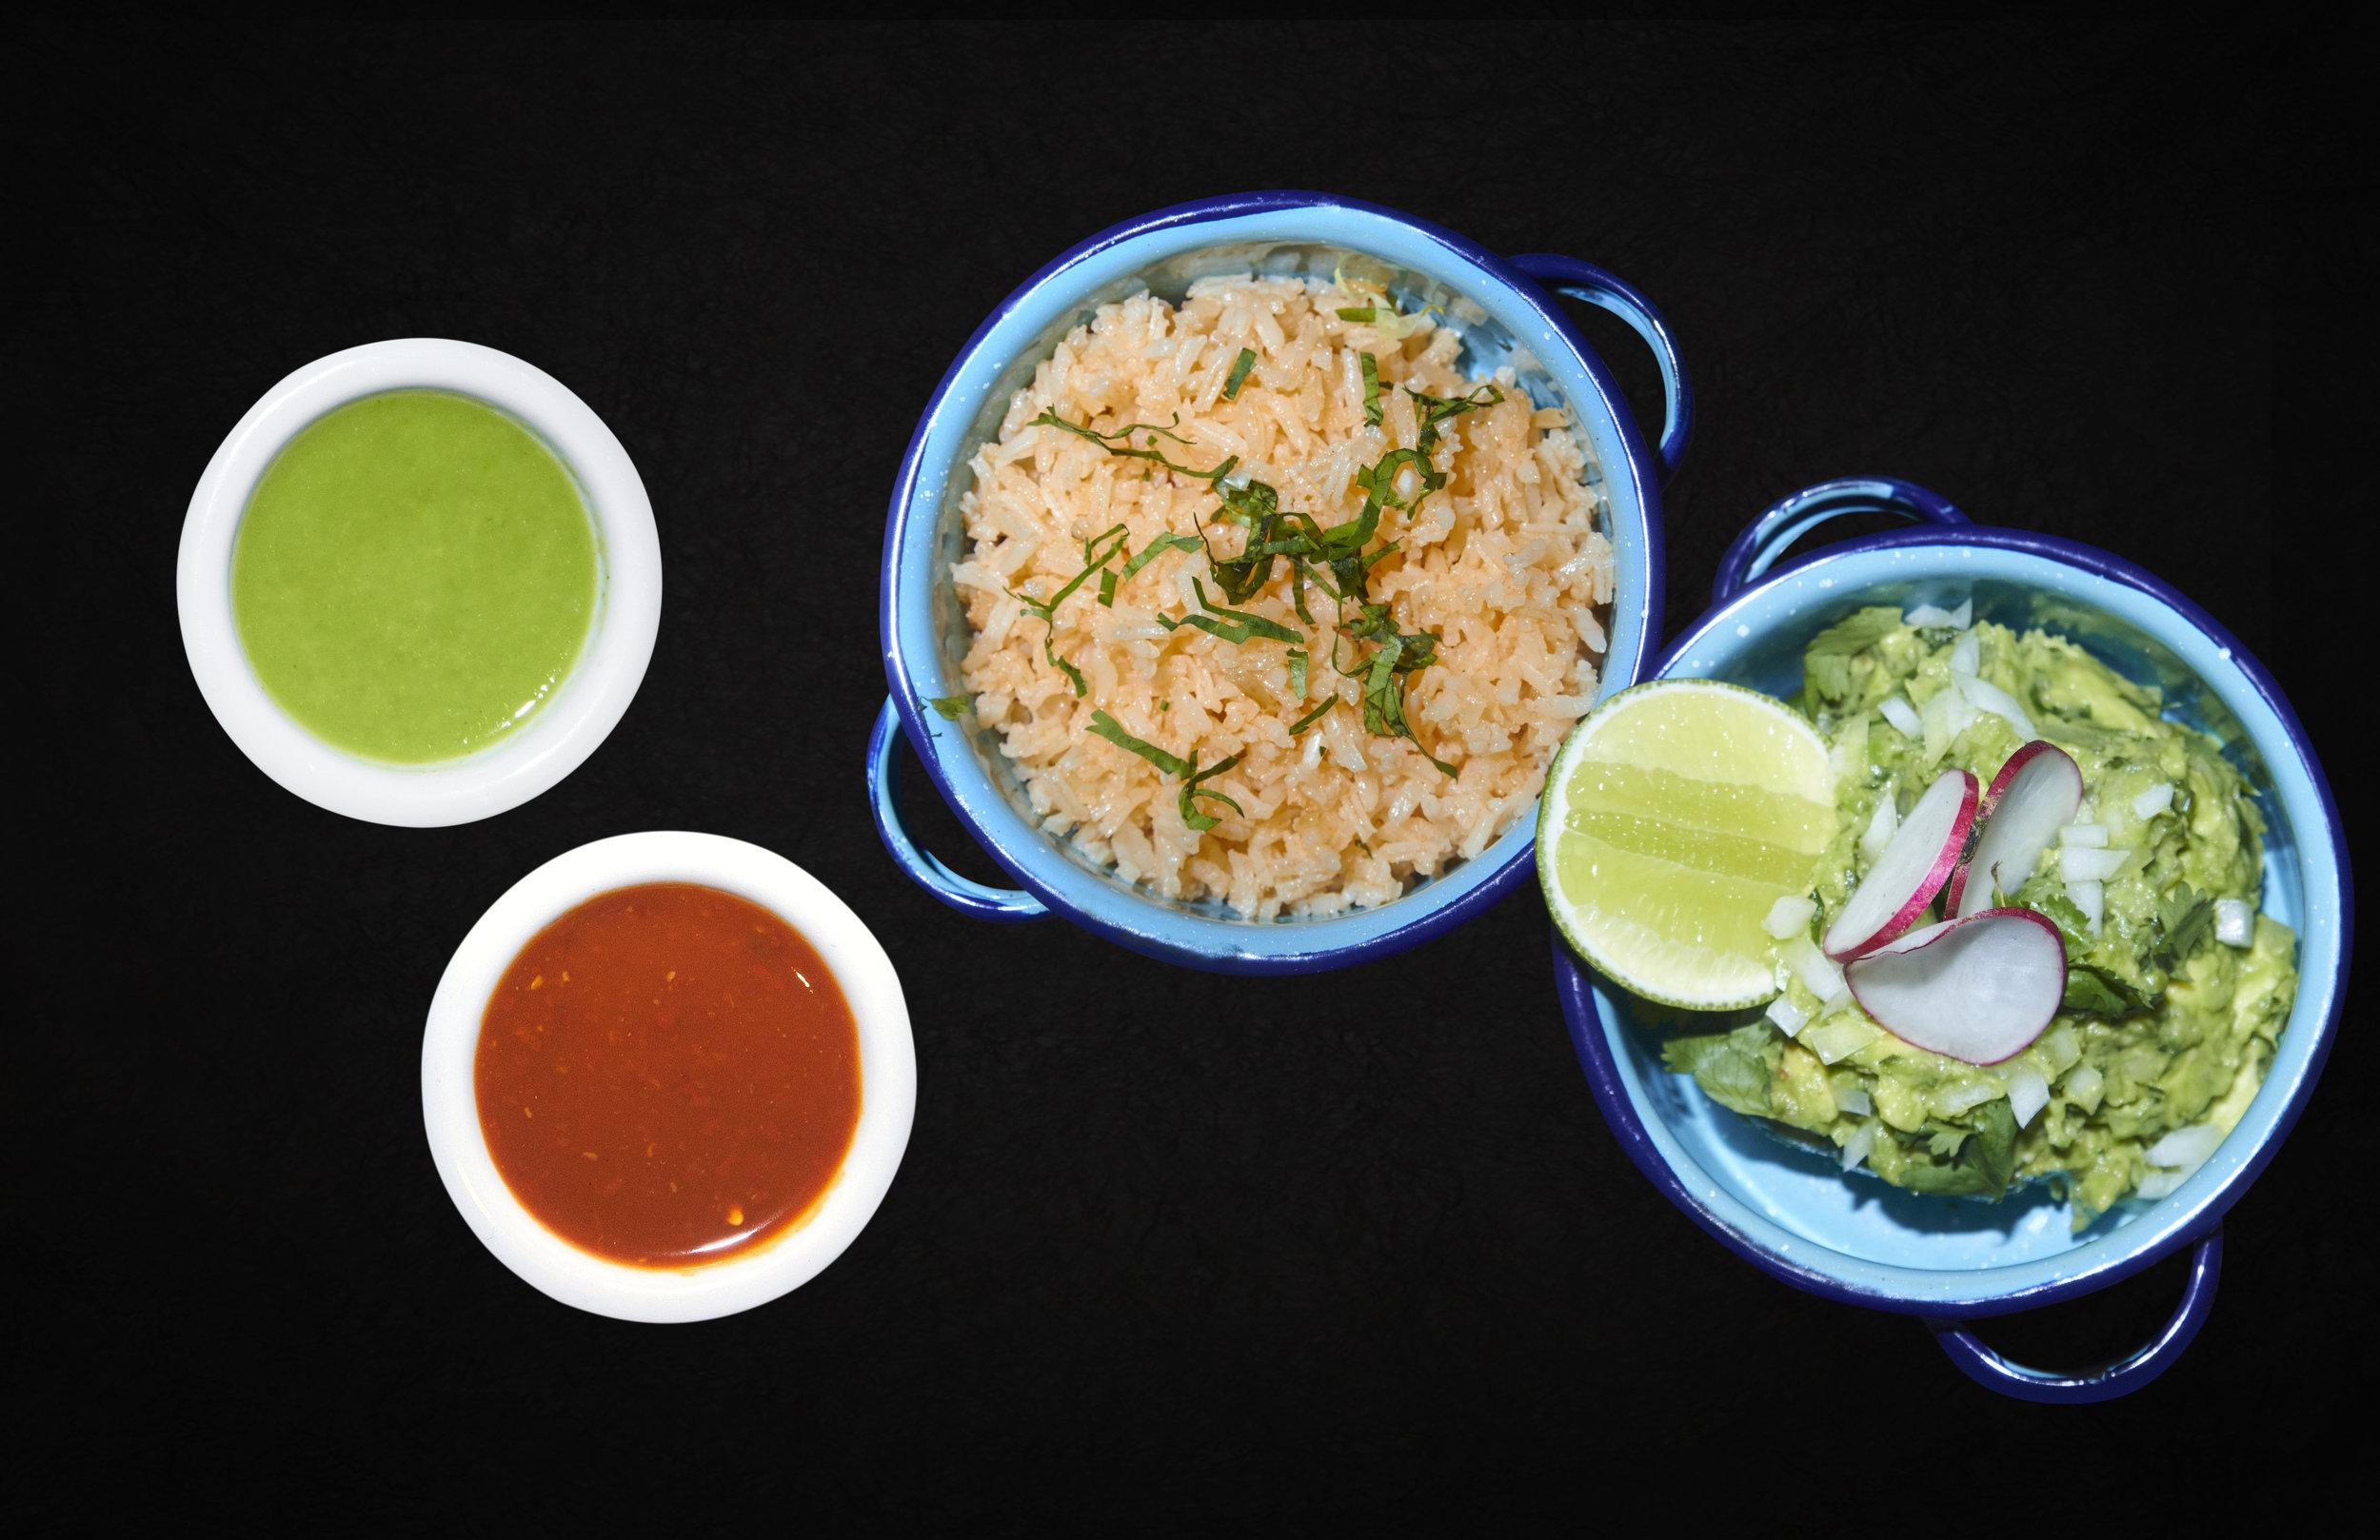 Mariachis-Food-sep20180122-4sides.jpg